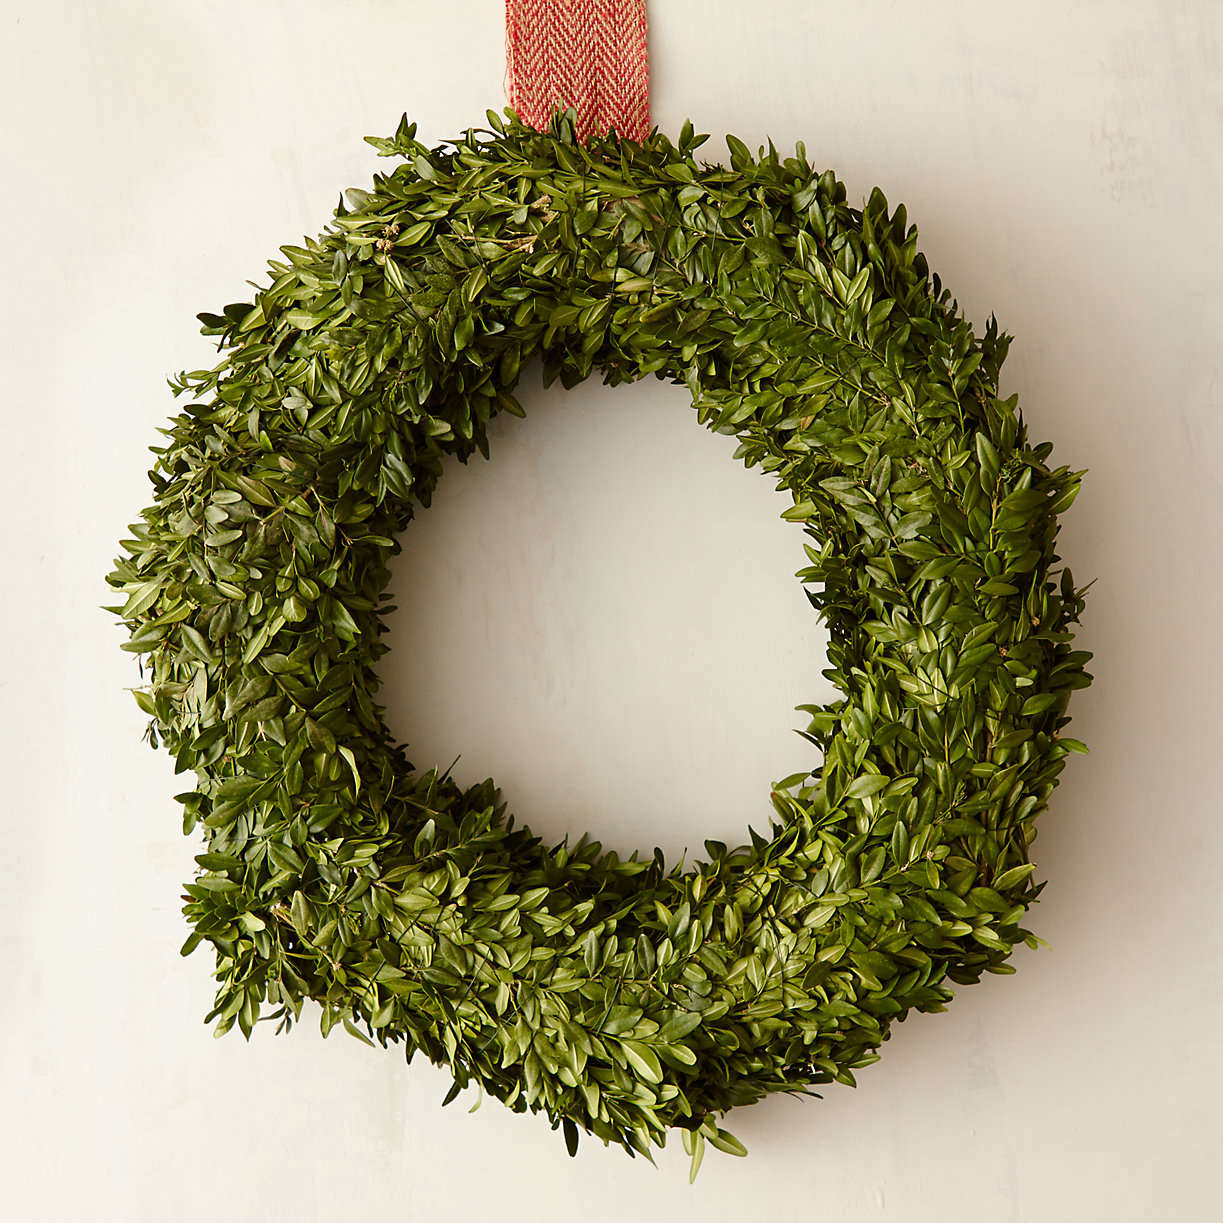 dried-boxwood-wreath-from-terrain